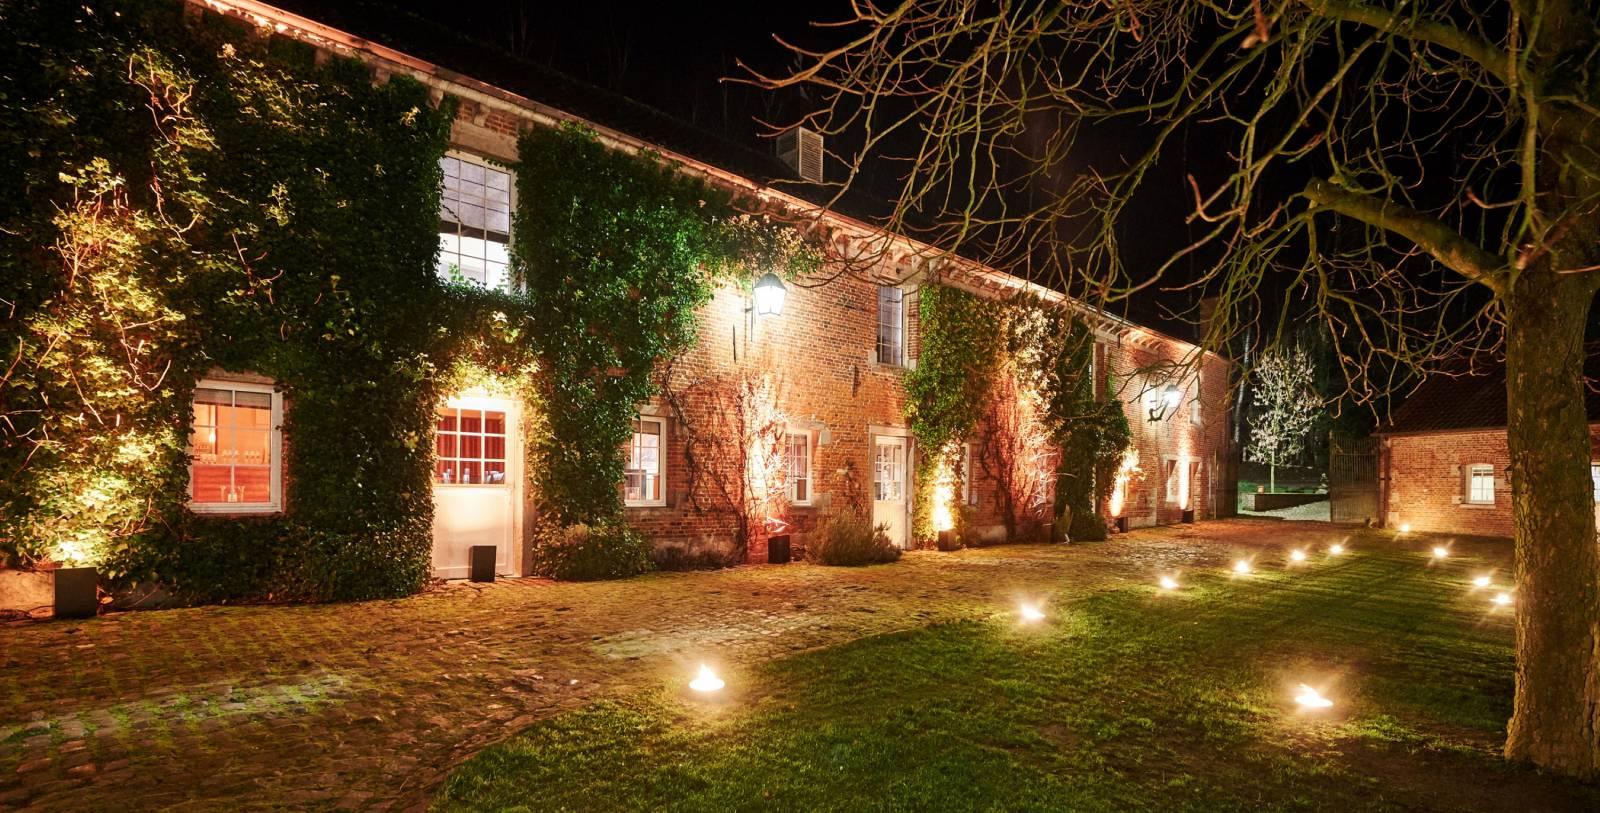 La ferme de Balingue House of Weddings feestzaal salle de fete lieu exceptionnel huwelijk mariage trouwen trouwzaal Brusse (5)